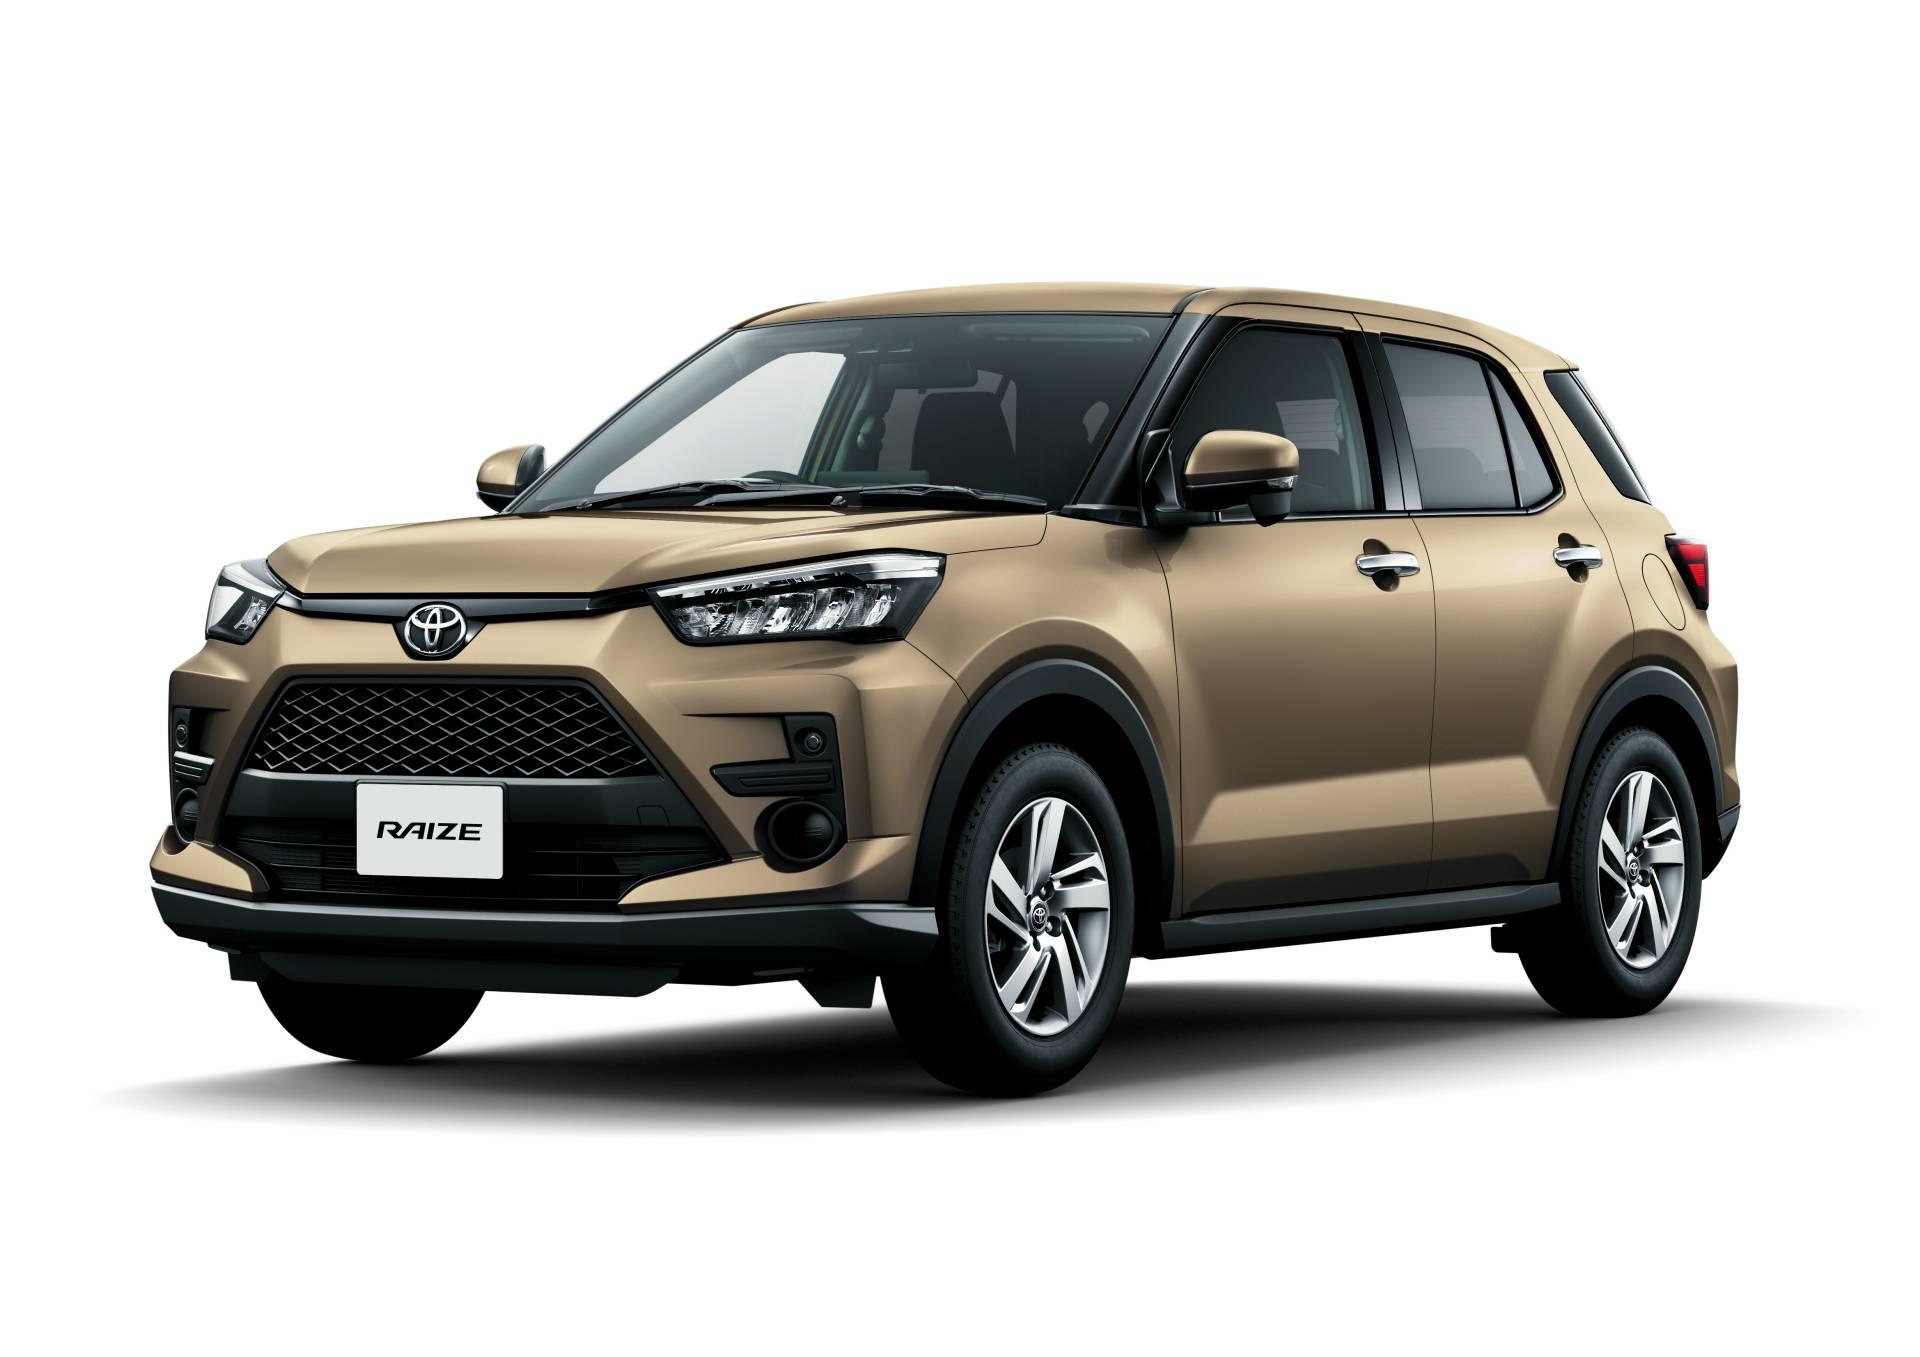 2020_Toyota_Raize_0037